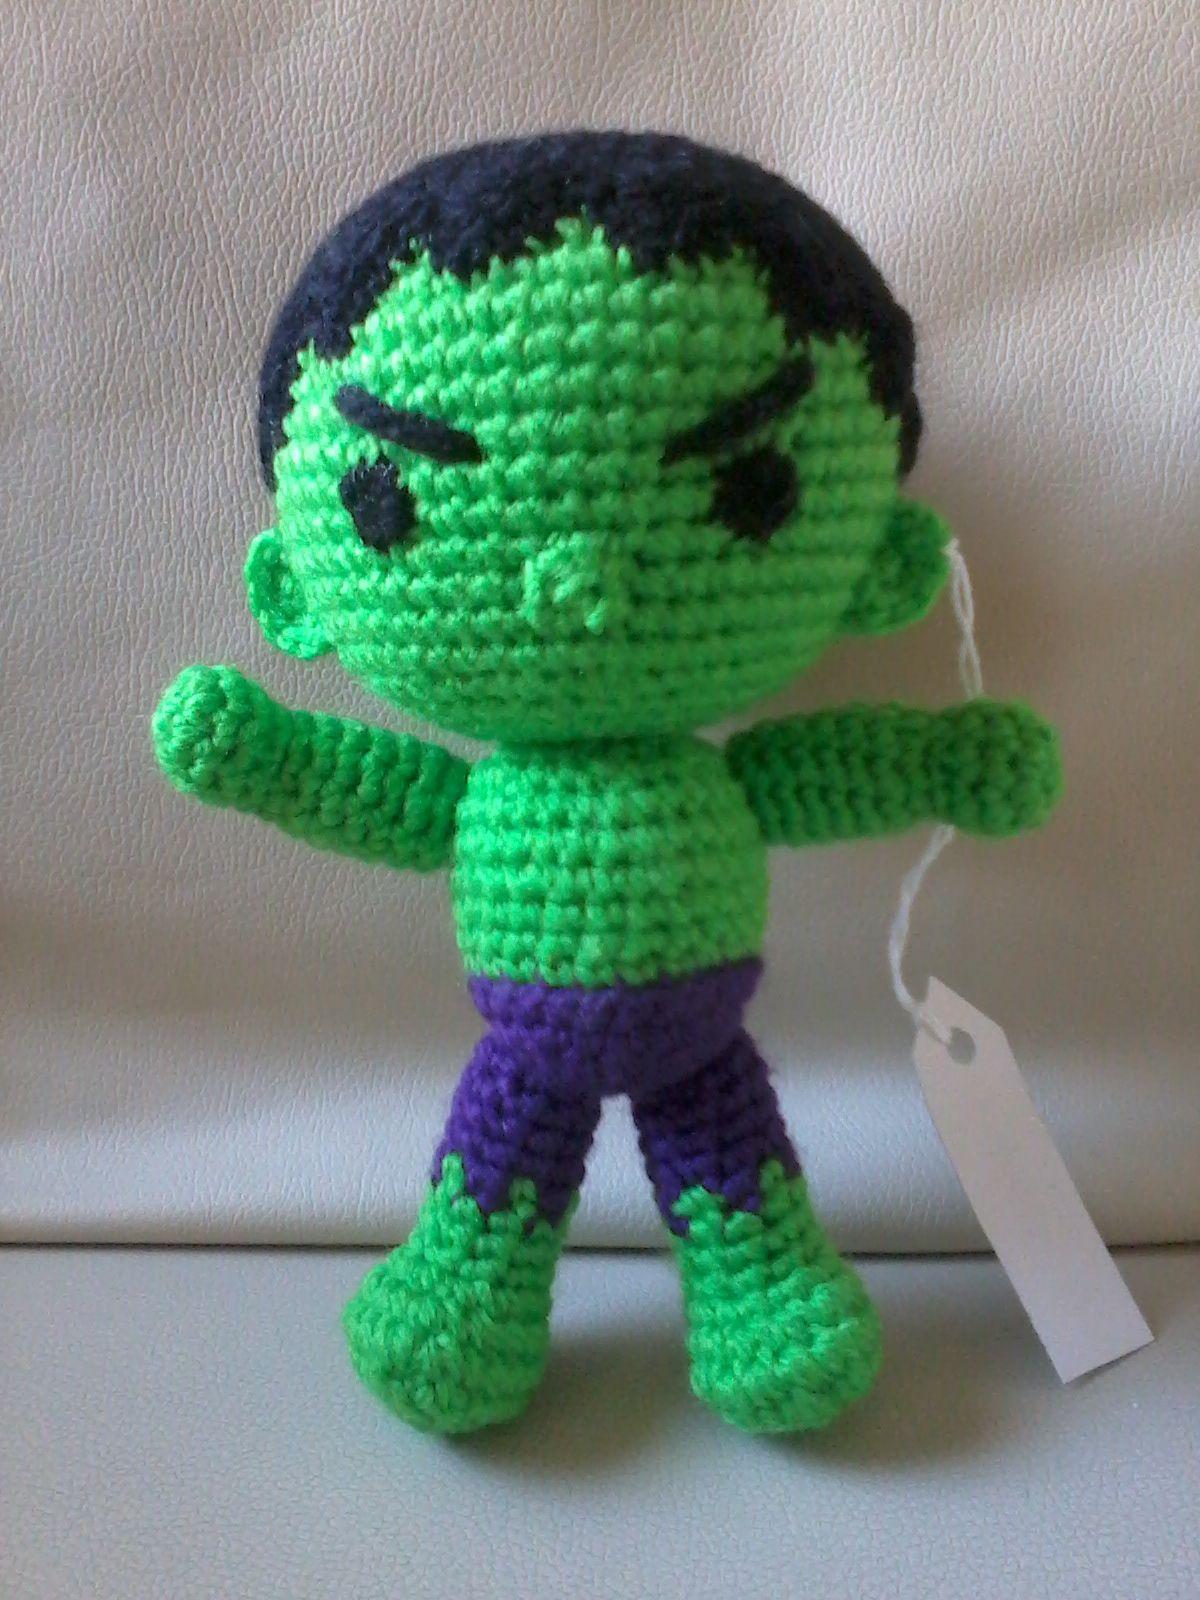 Incredible Hulk crochet amigurumi toy. Inspired by Marvel ...   1600x1200